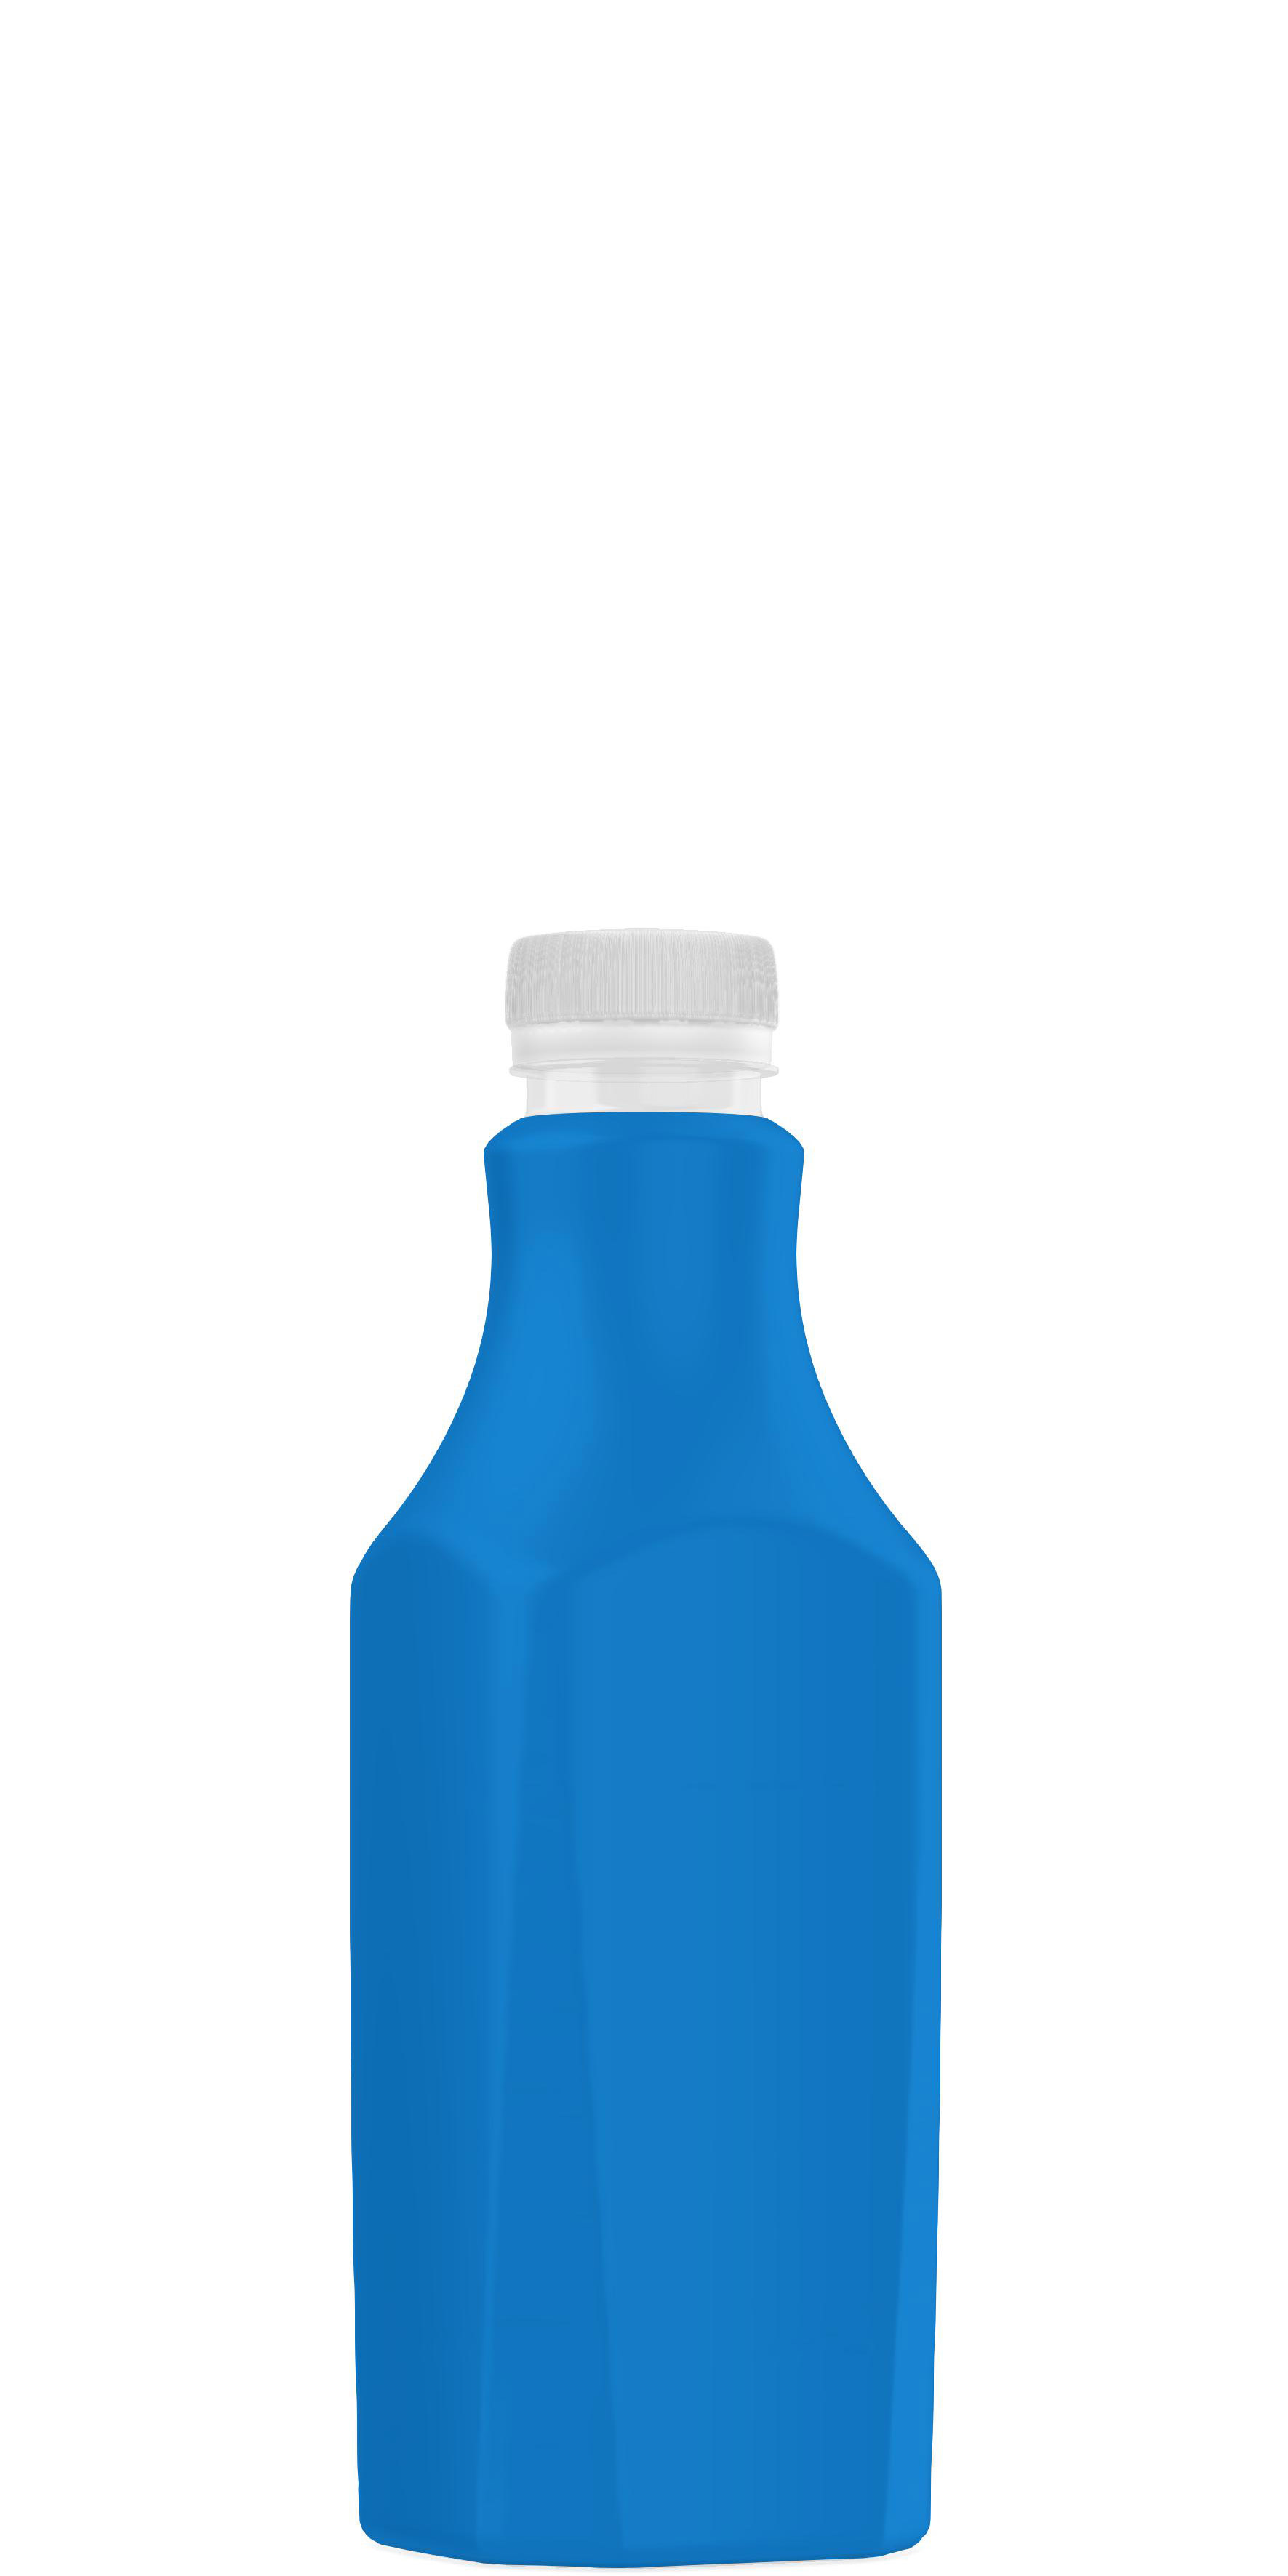 Packaging shape of fruit juice 500ml to 1L